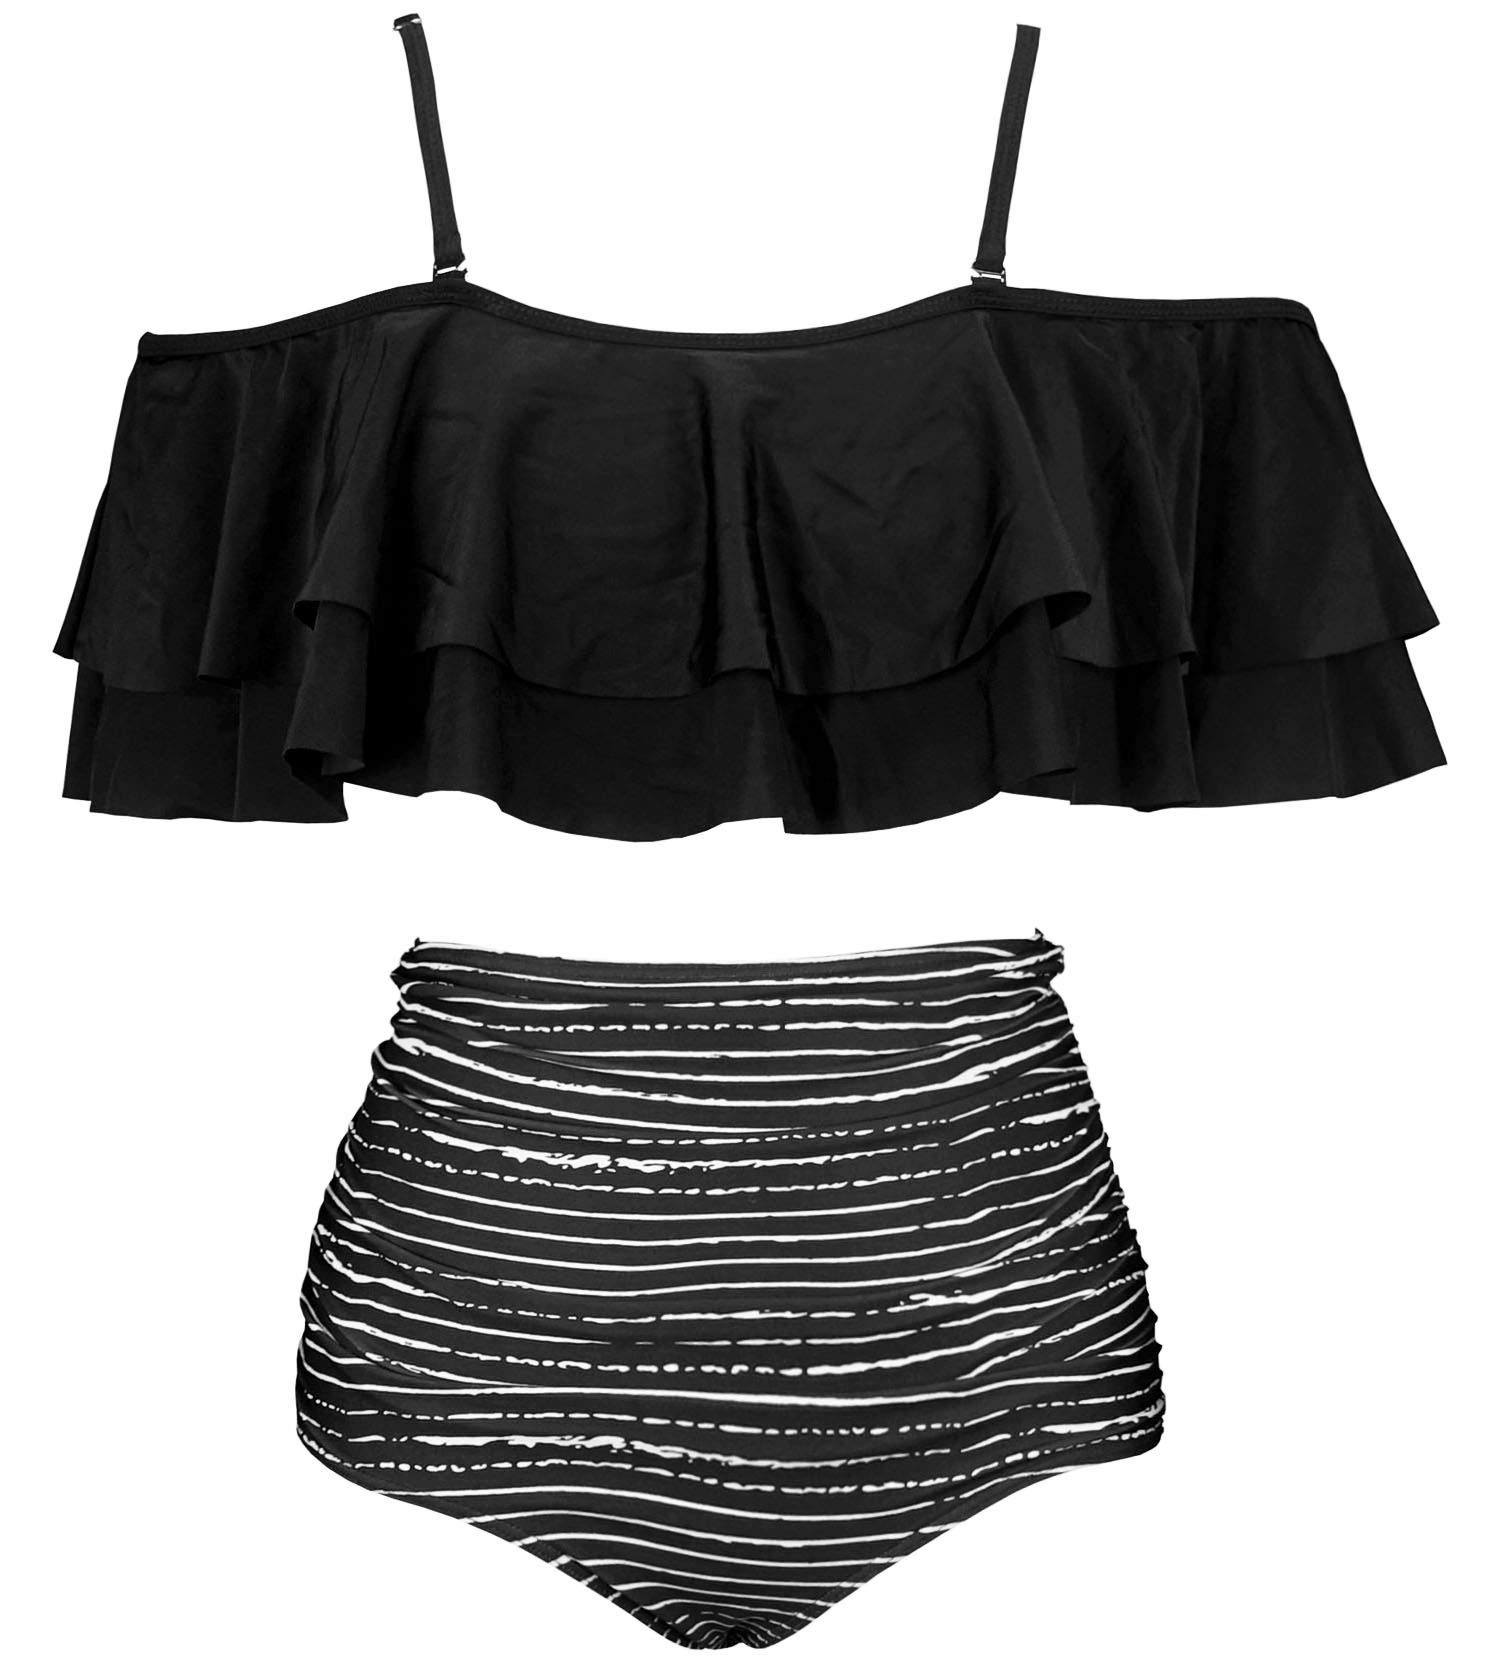 94620e99f4a38 Galleon - COCOSHIP Black Striped   White Balancing Act Two Piece Flounce  Falbala Bikini Set Off Shoulder Ruffled Swimsuit Cruise Swimwear S